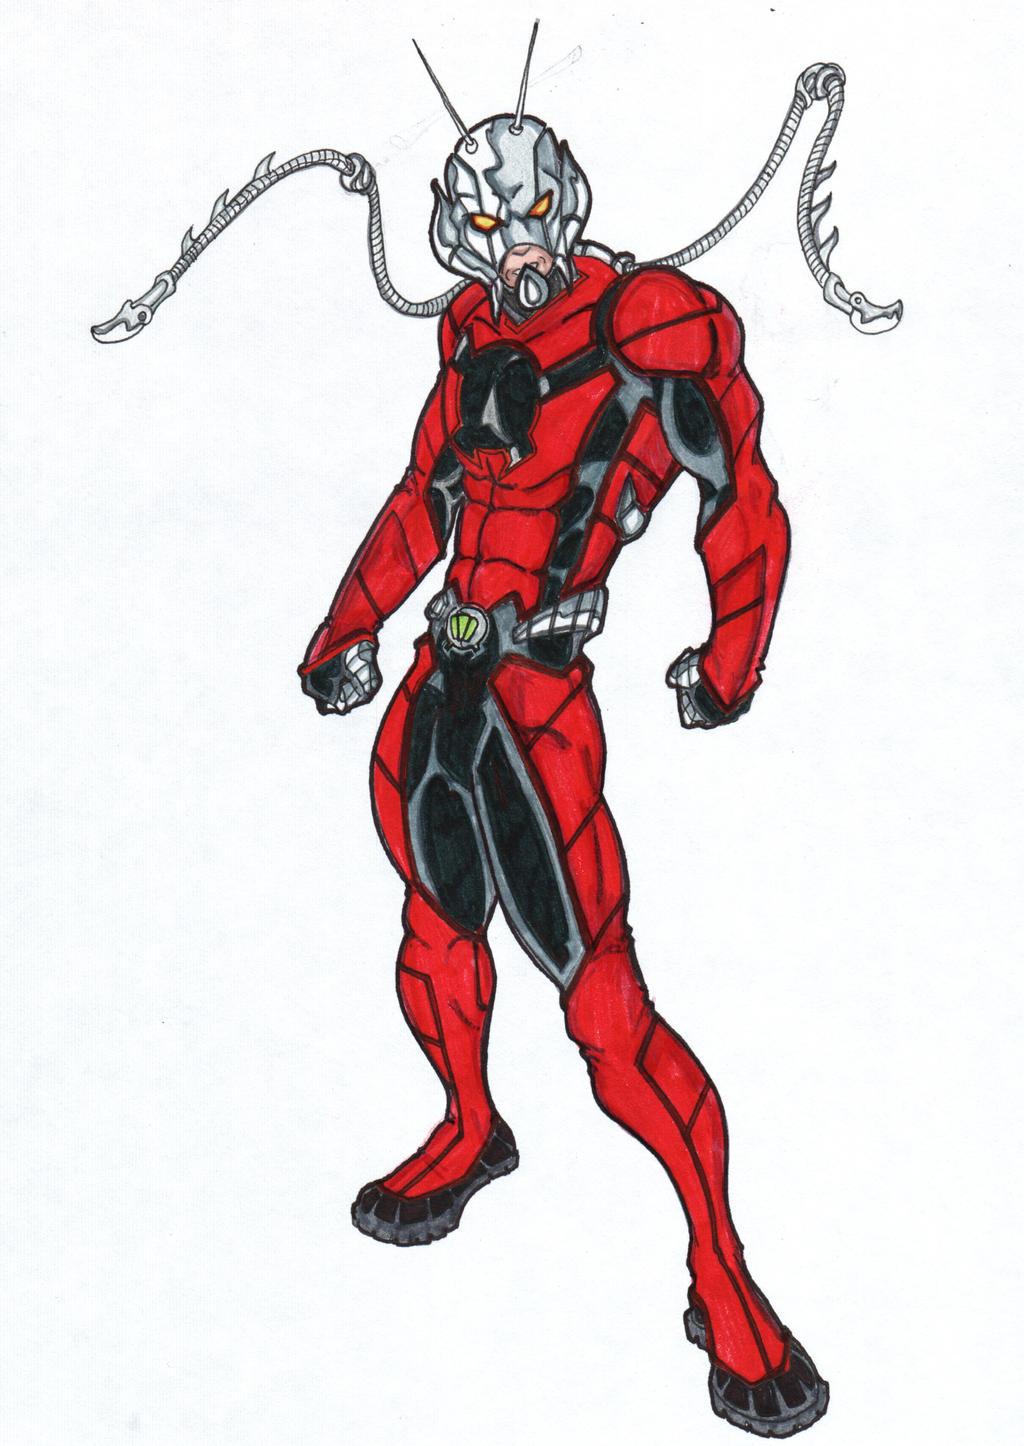 Marvel revolt ant man by frischdvh on deviantart marvel revolt ant man by frischdvh biocorpaavc